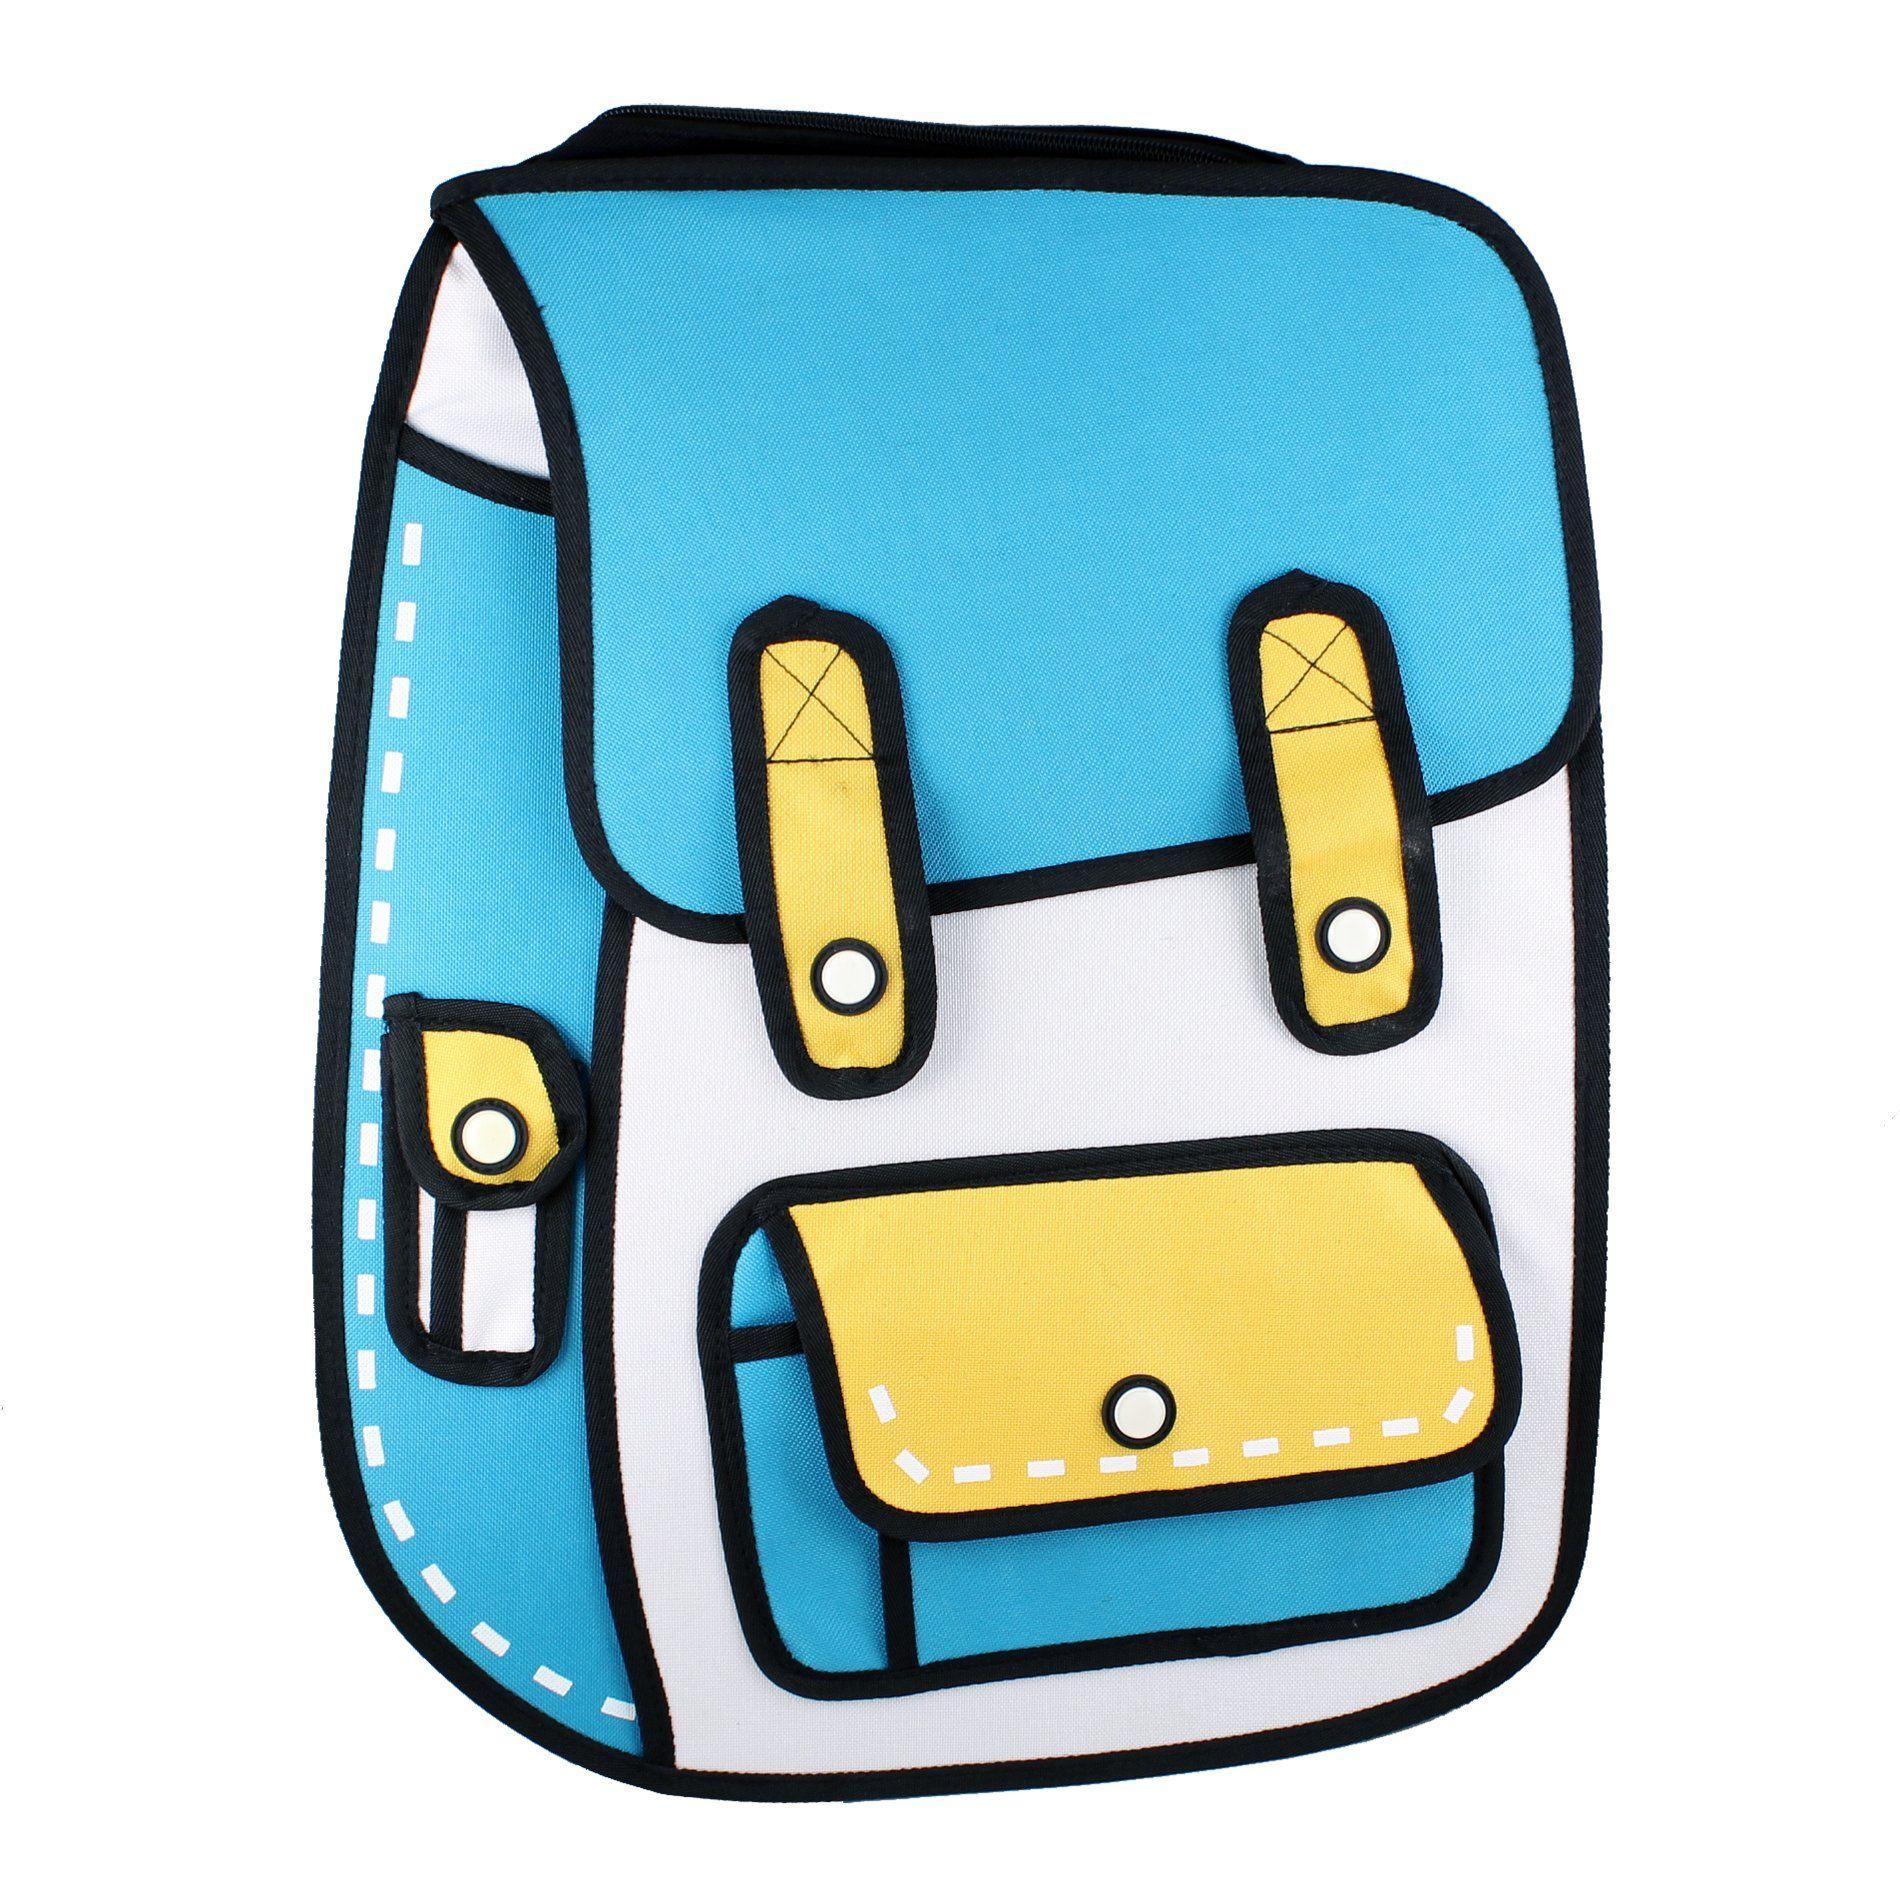 Get Blue Cartoon Handbag PNG